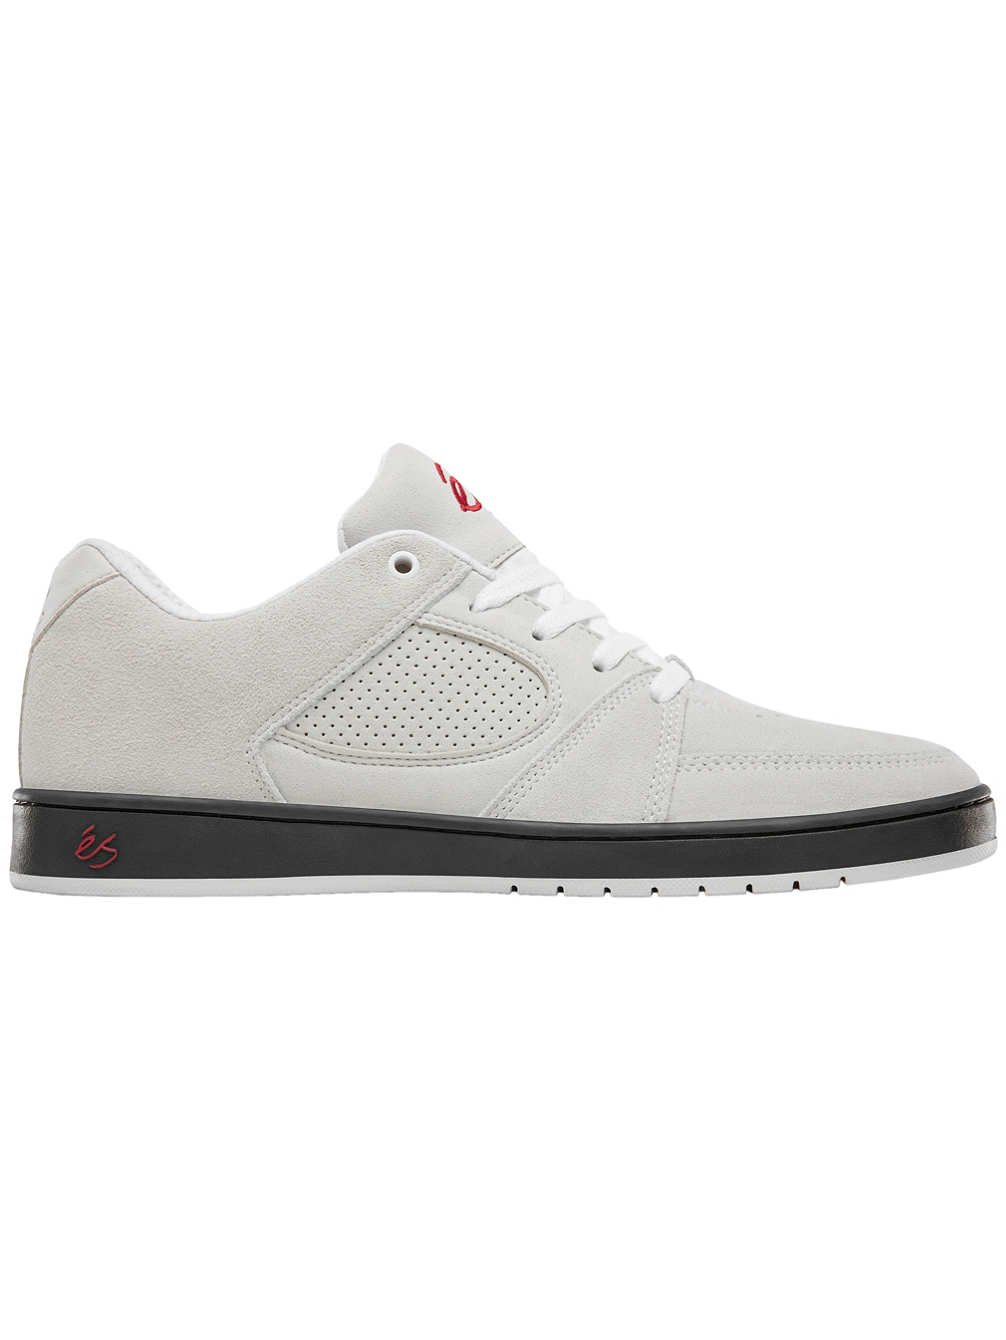 eS Men's Accel Slim Skate Shoe 12 D(M) US|White/Black